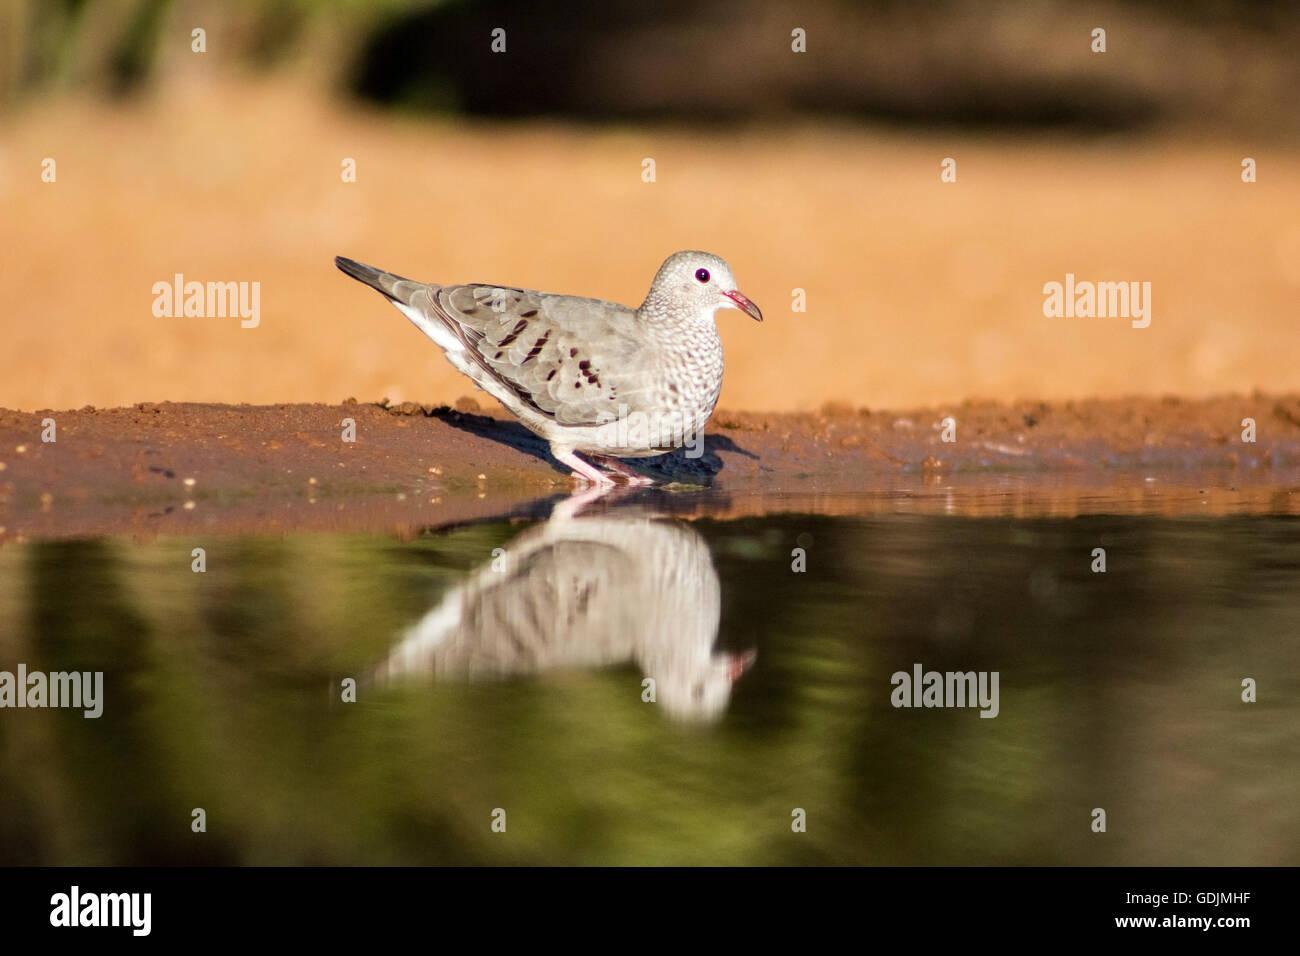 Common Ground-dove (Columbina passerina)  - Santa Clara Ranch, McCook, Texas, USA - Stock Image